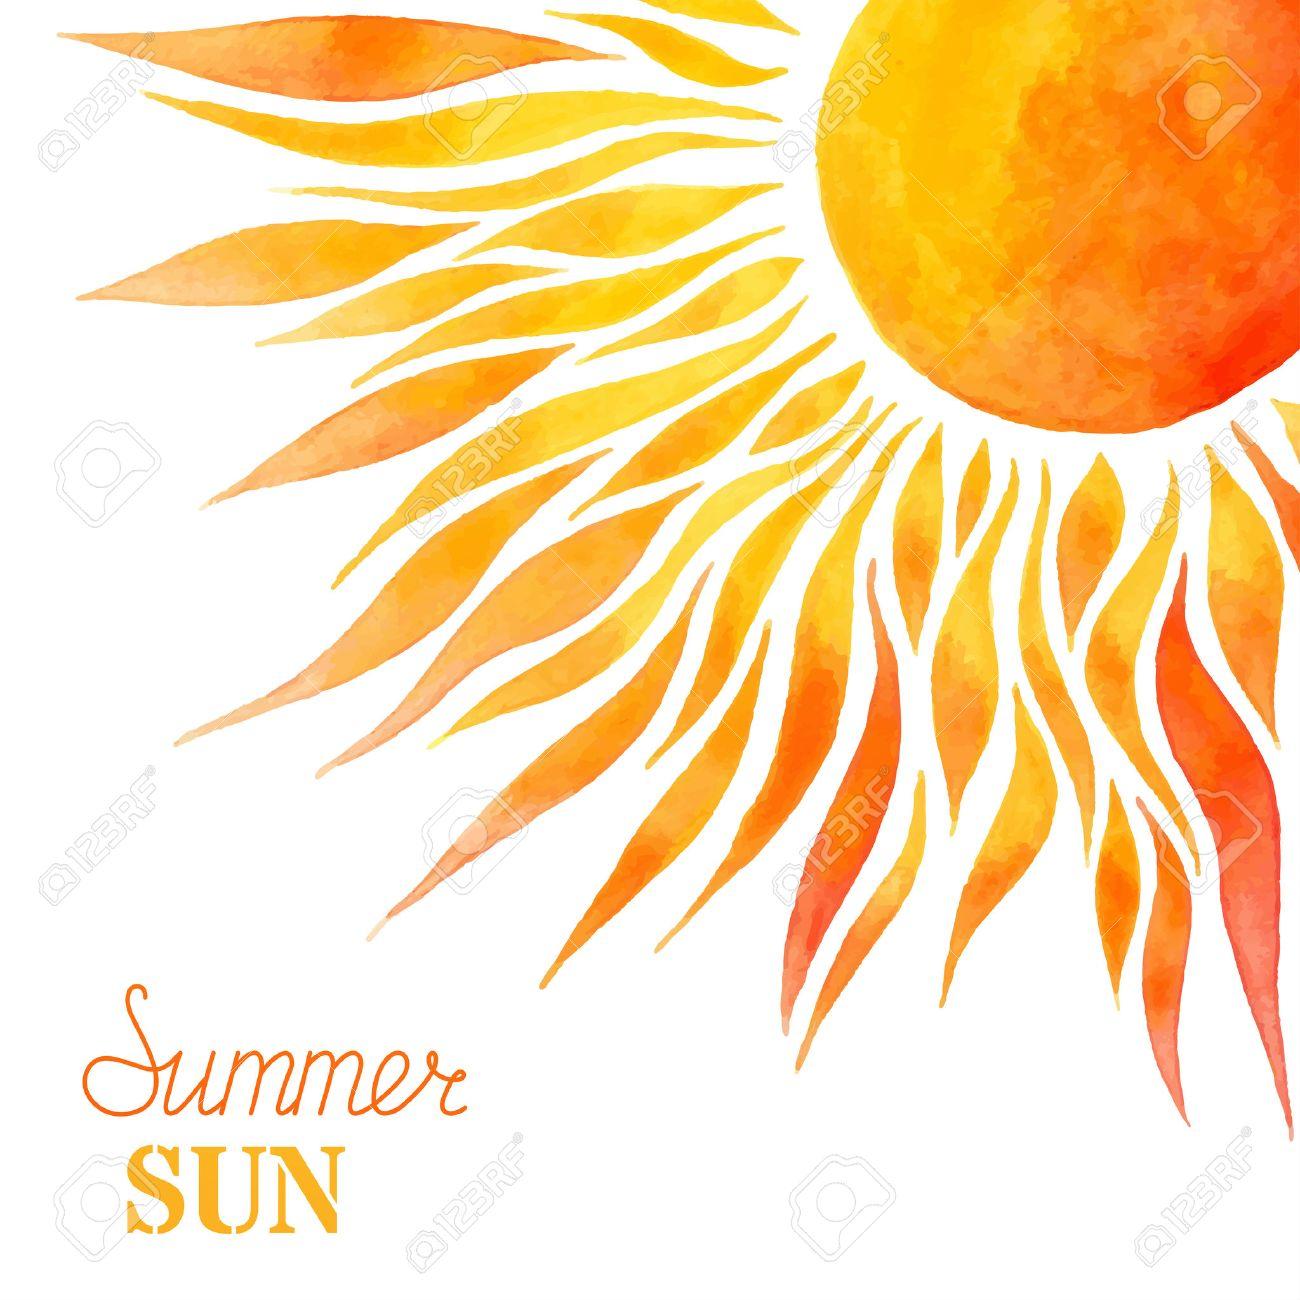 77,014 Sunrise Stock Vector Illustration And Royalty Free Sunrise ...